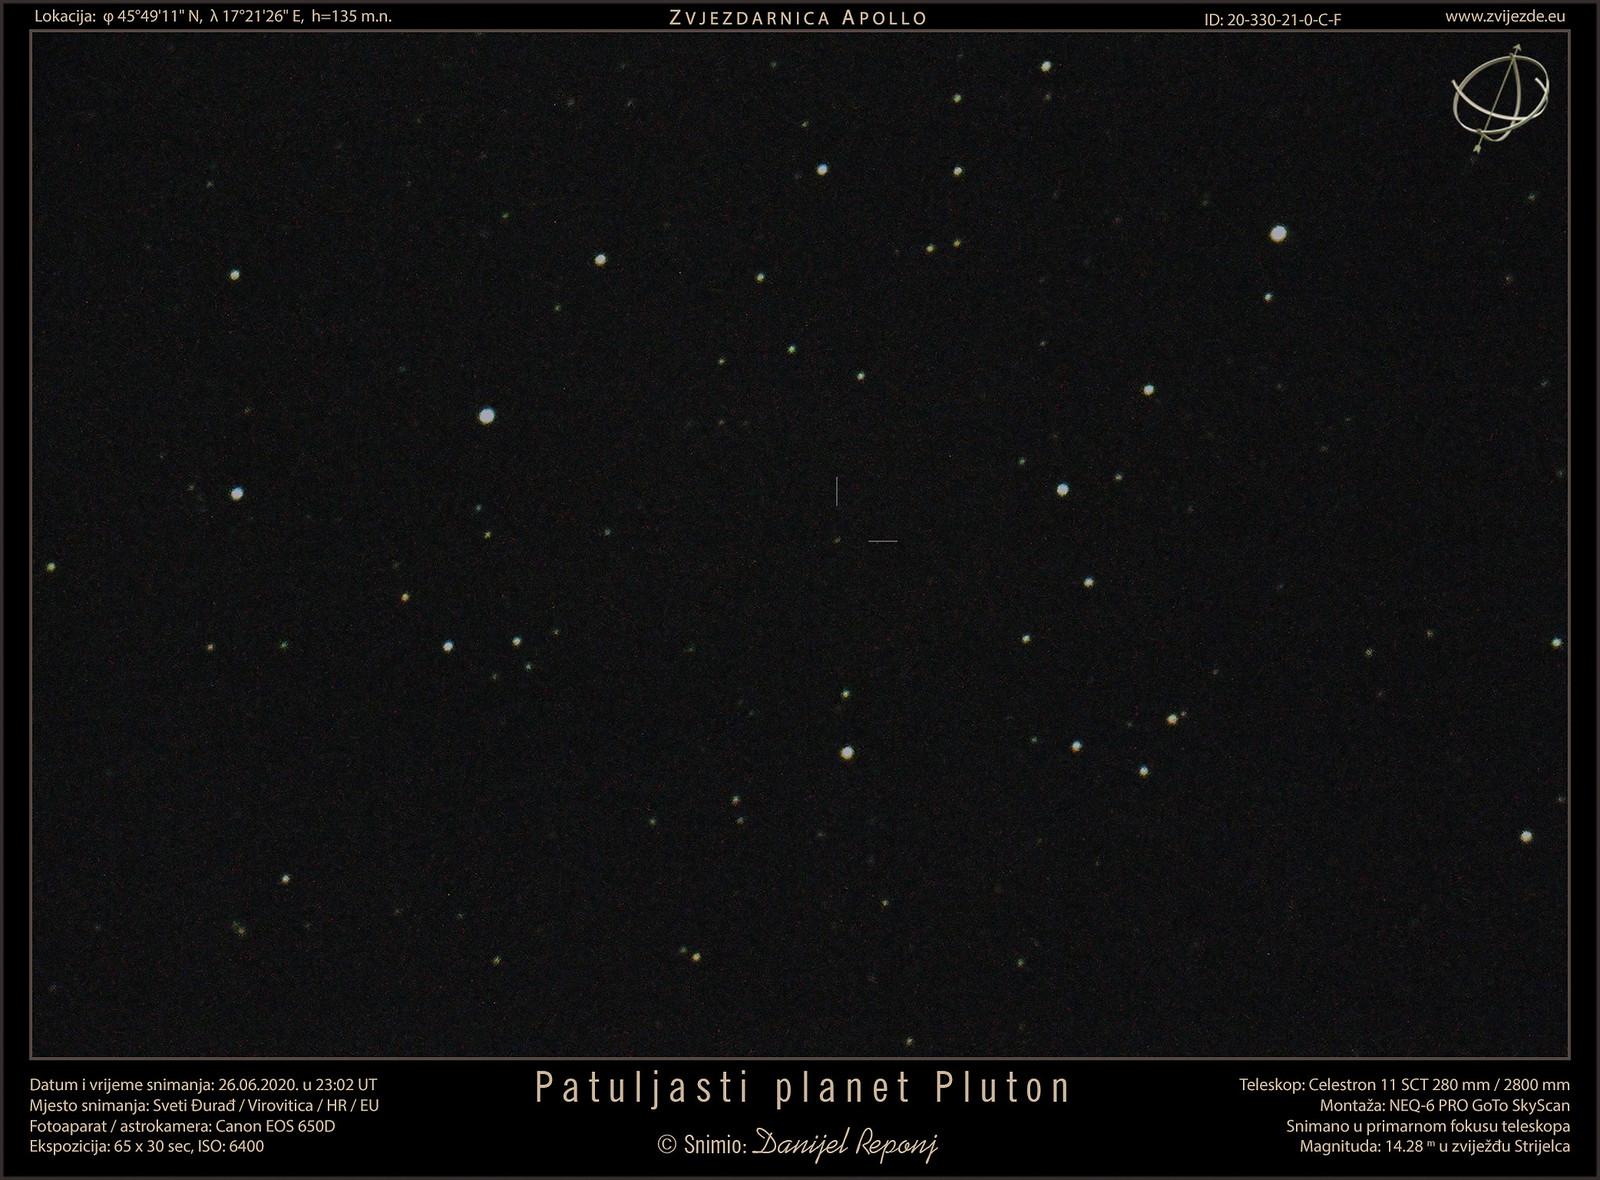 Patuljasti planet Pluton, 26.6.2020.